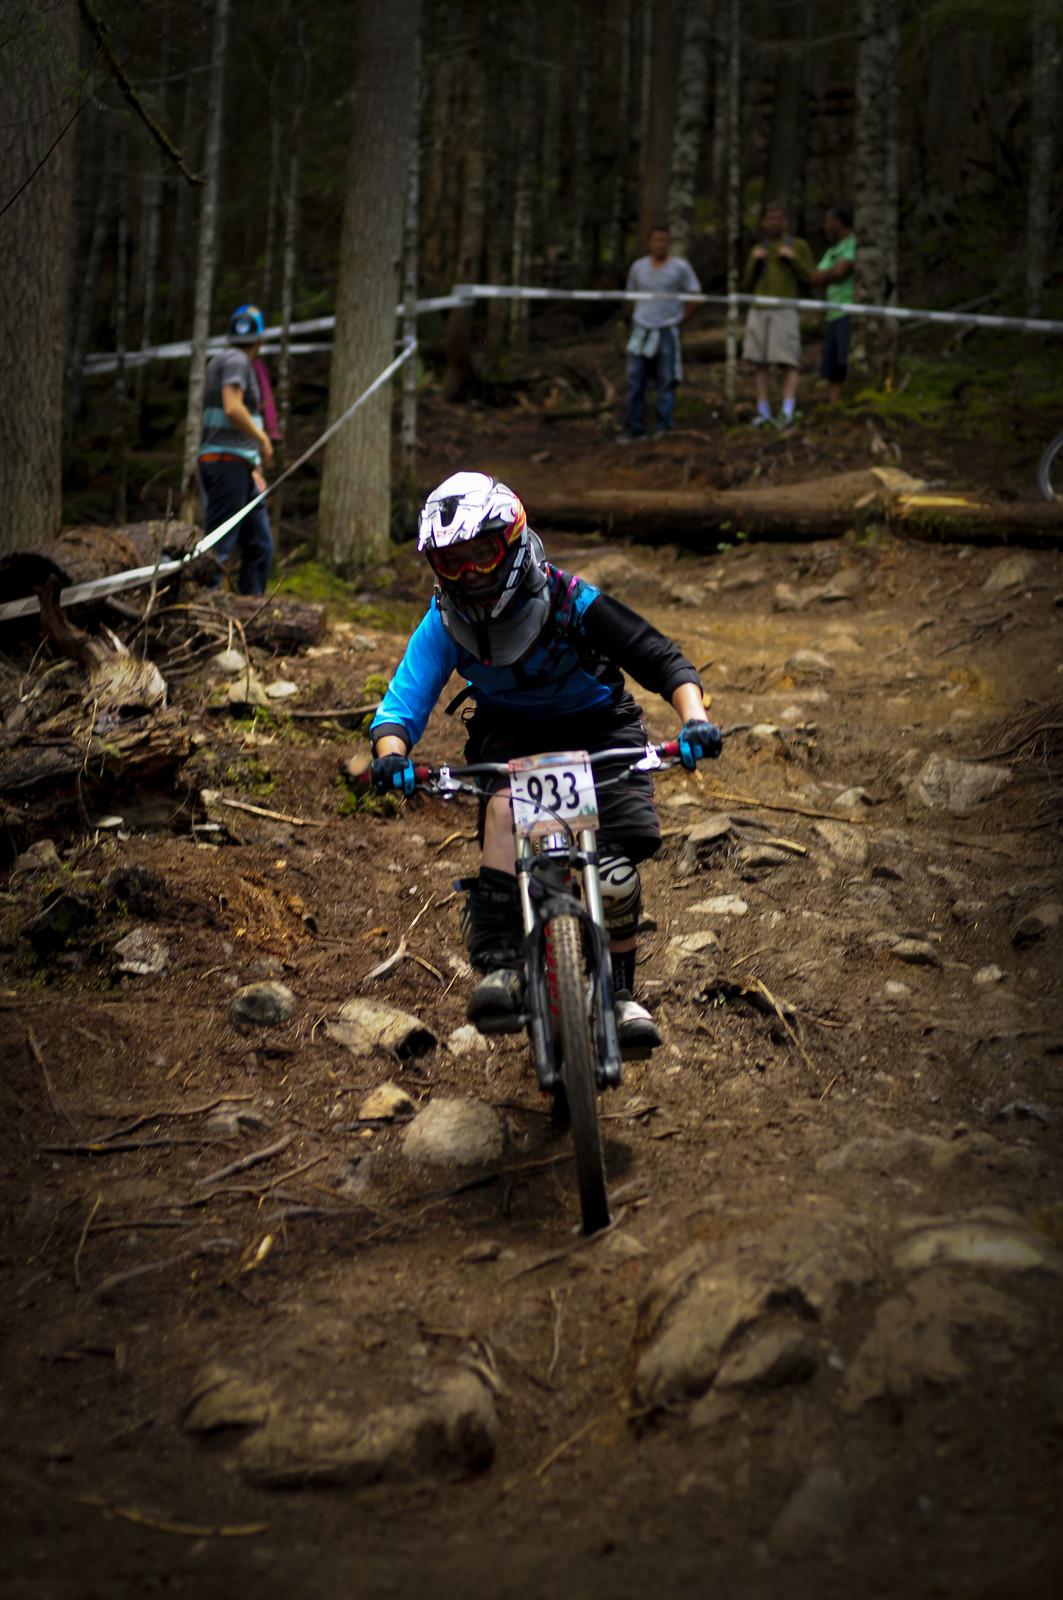 Canadian Open Lula Darquier - ezefaccio - Mountain Biking Pictures - Vital MTB